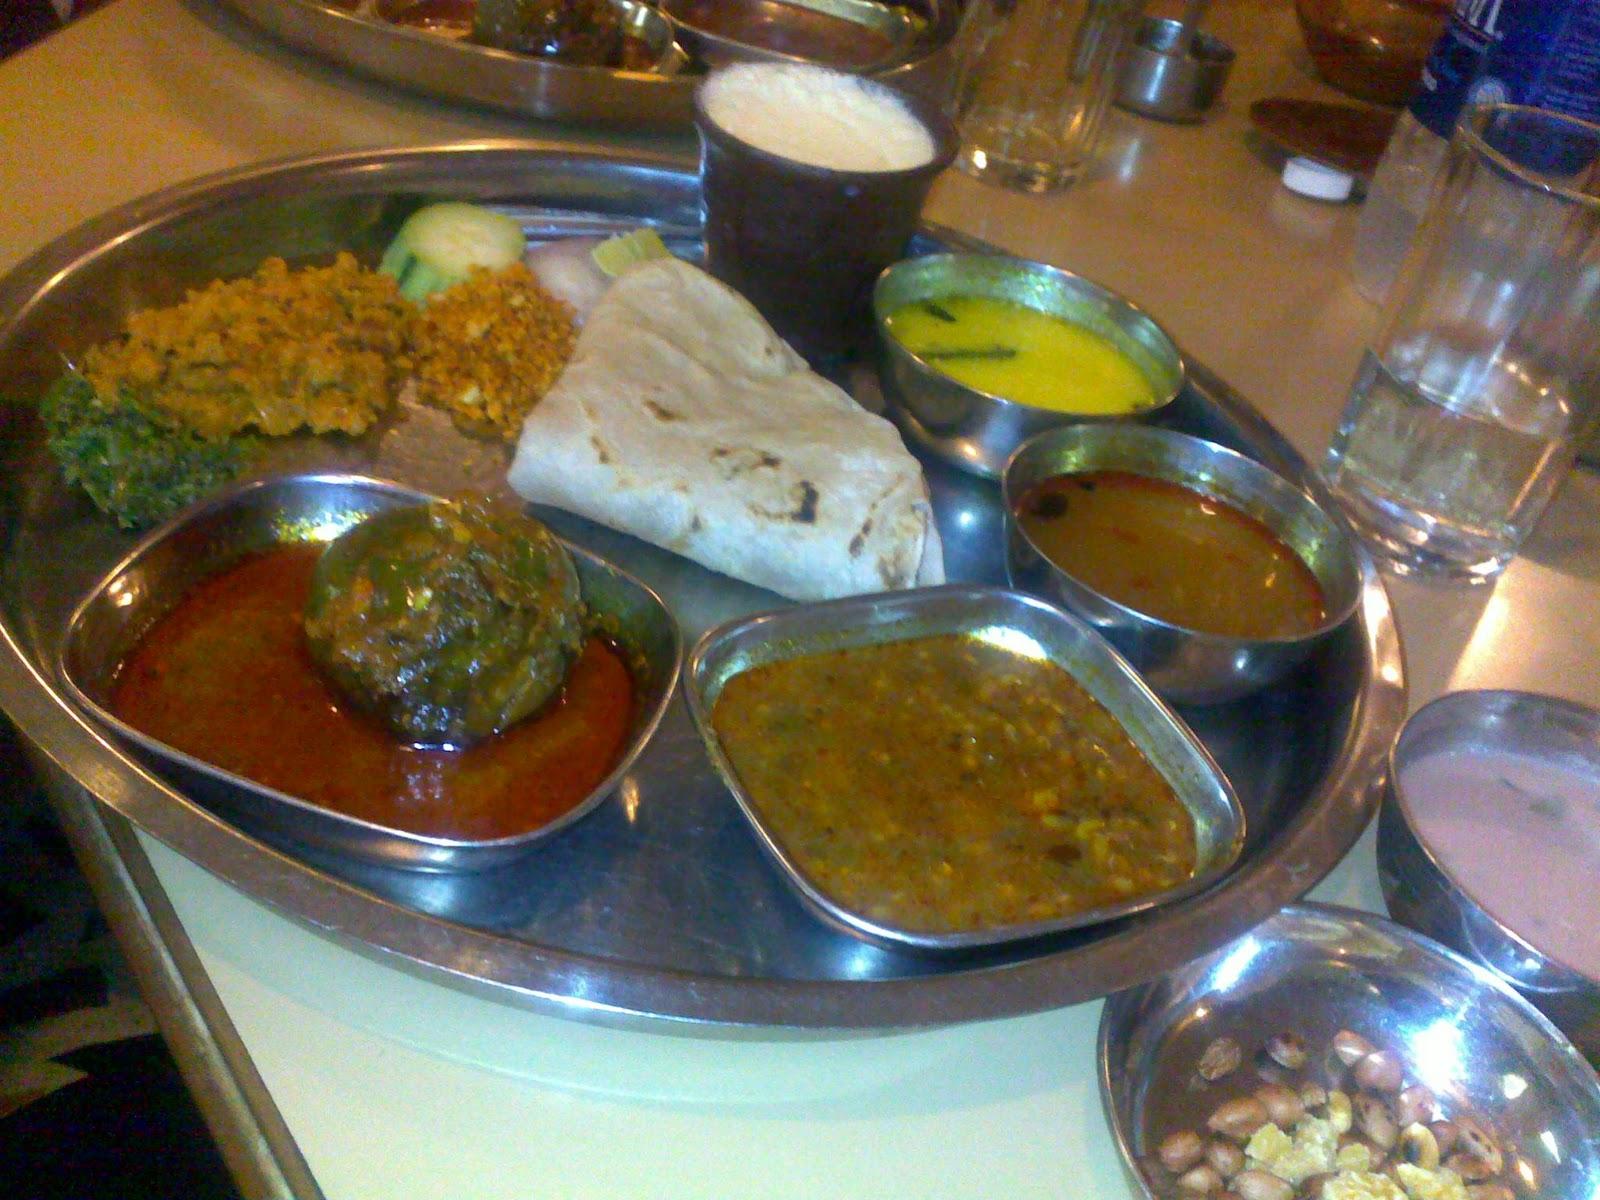 The indo foodie marathi food in sangli satara kolhapur belt marathi food in sangli satara kolhapur belt forumfinder Images